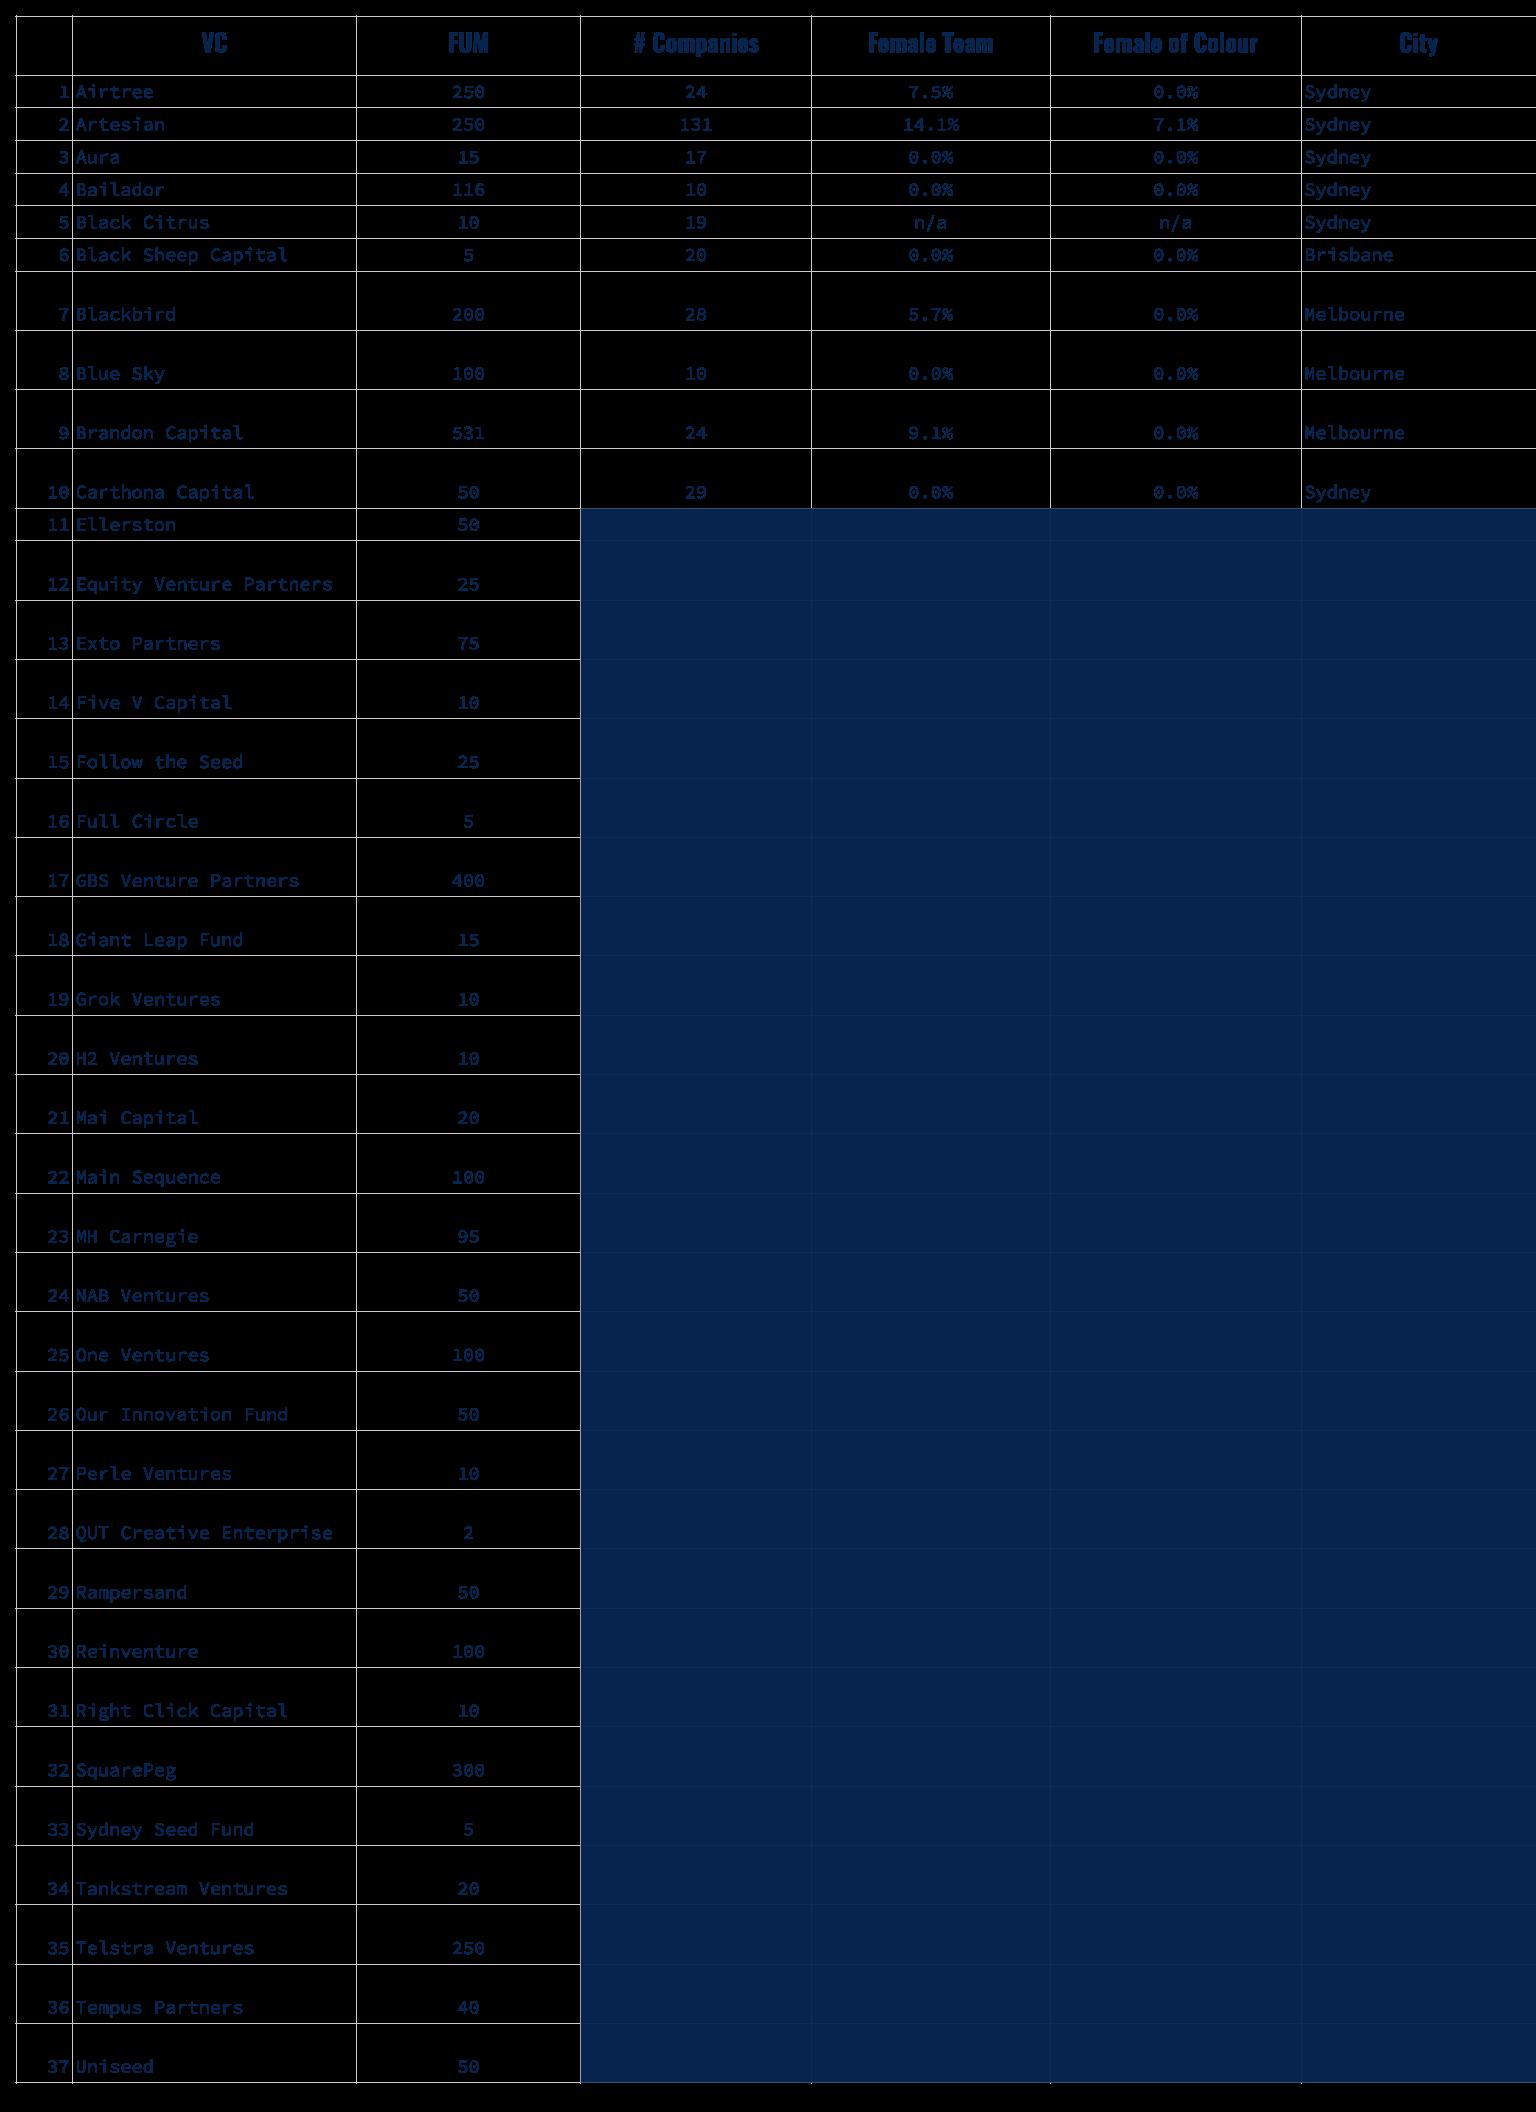 Australian VC Rankings.png